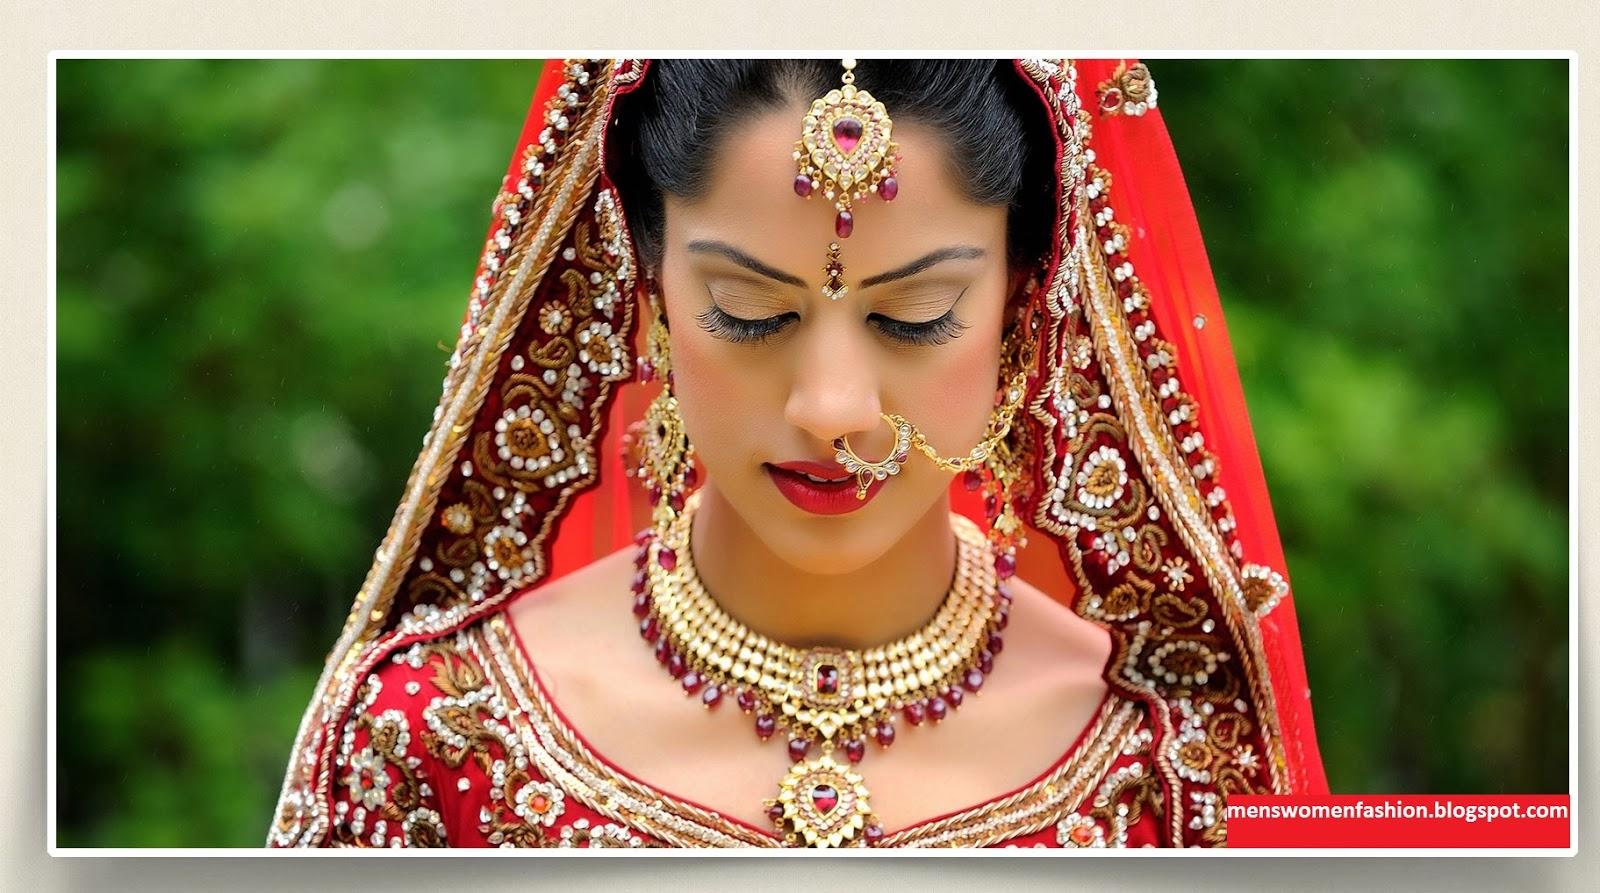 Indian Bridal Weddings Stylish Jewelry Collection 52 Fashion Jewellery